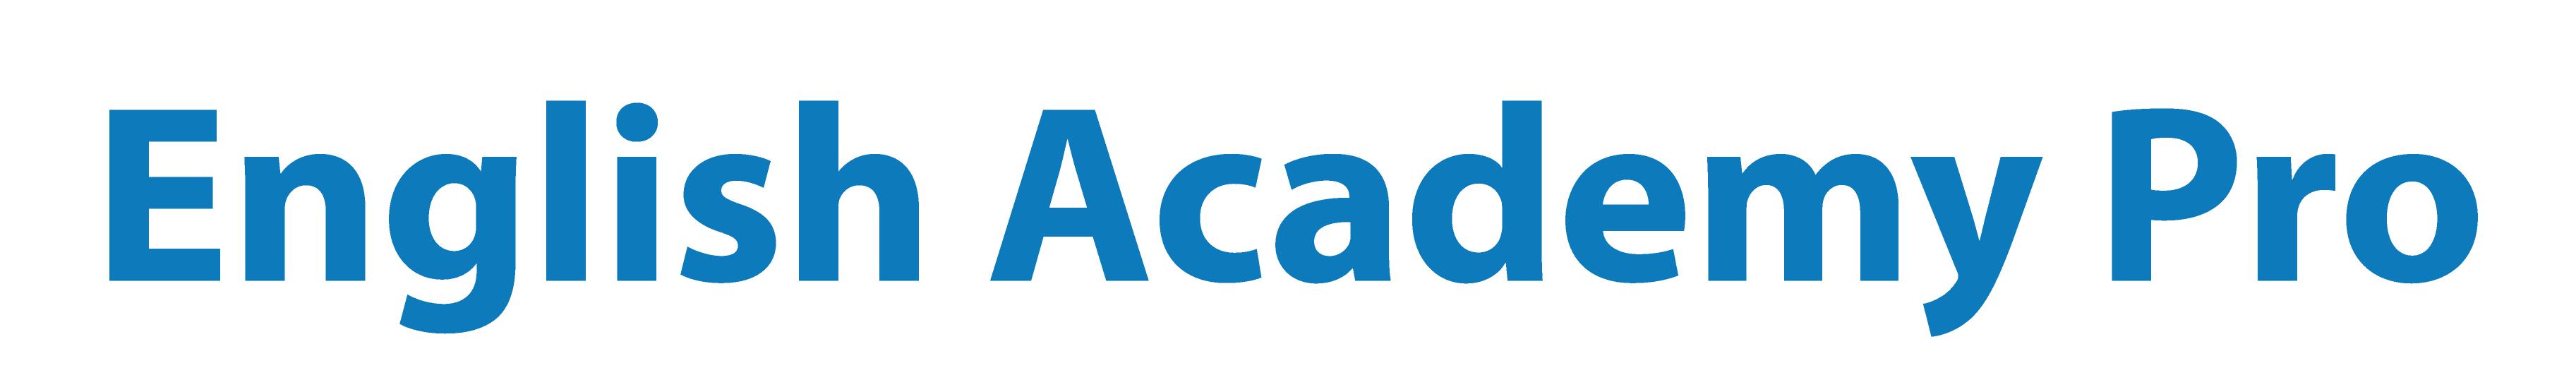 English Academy Pro